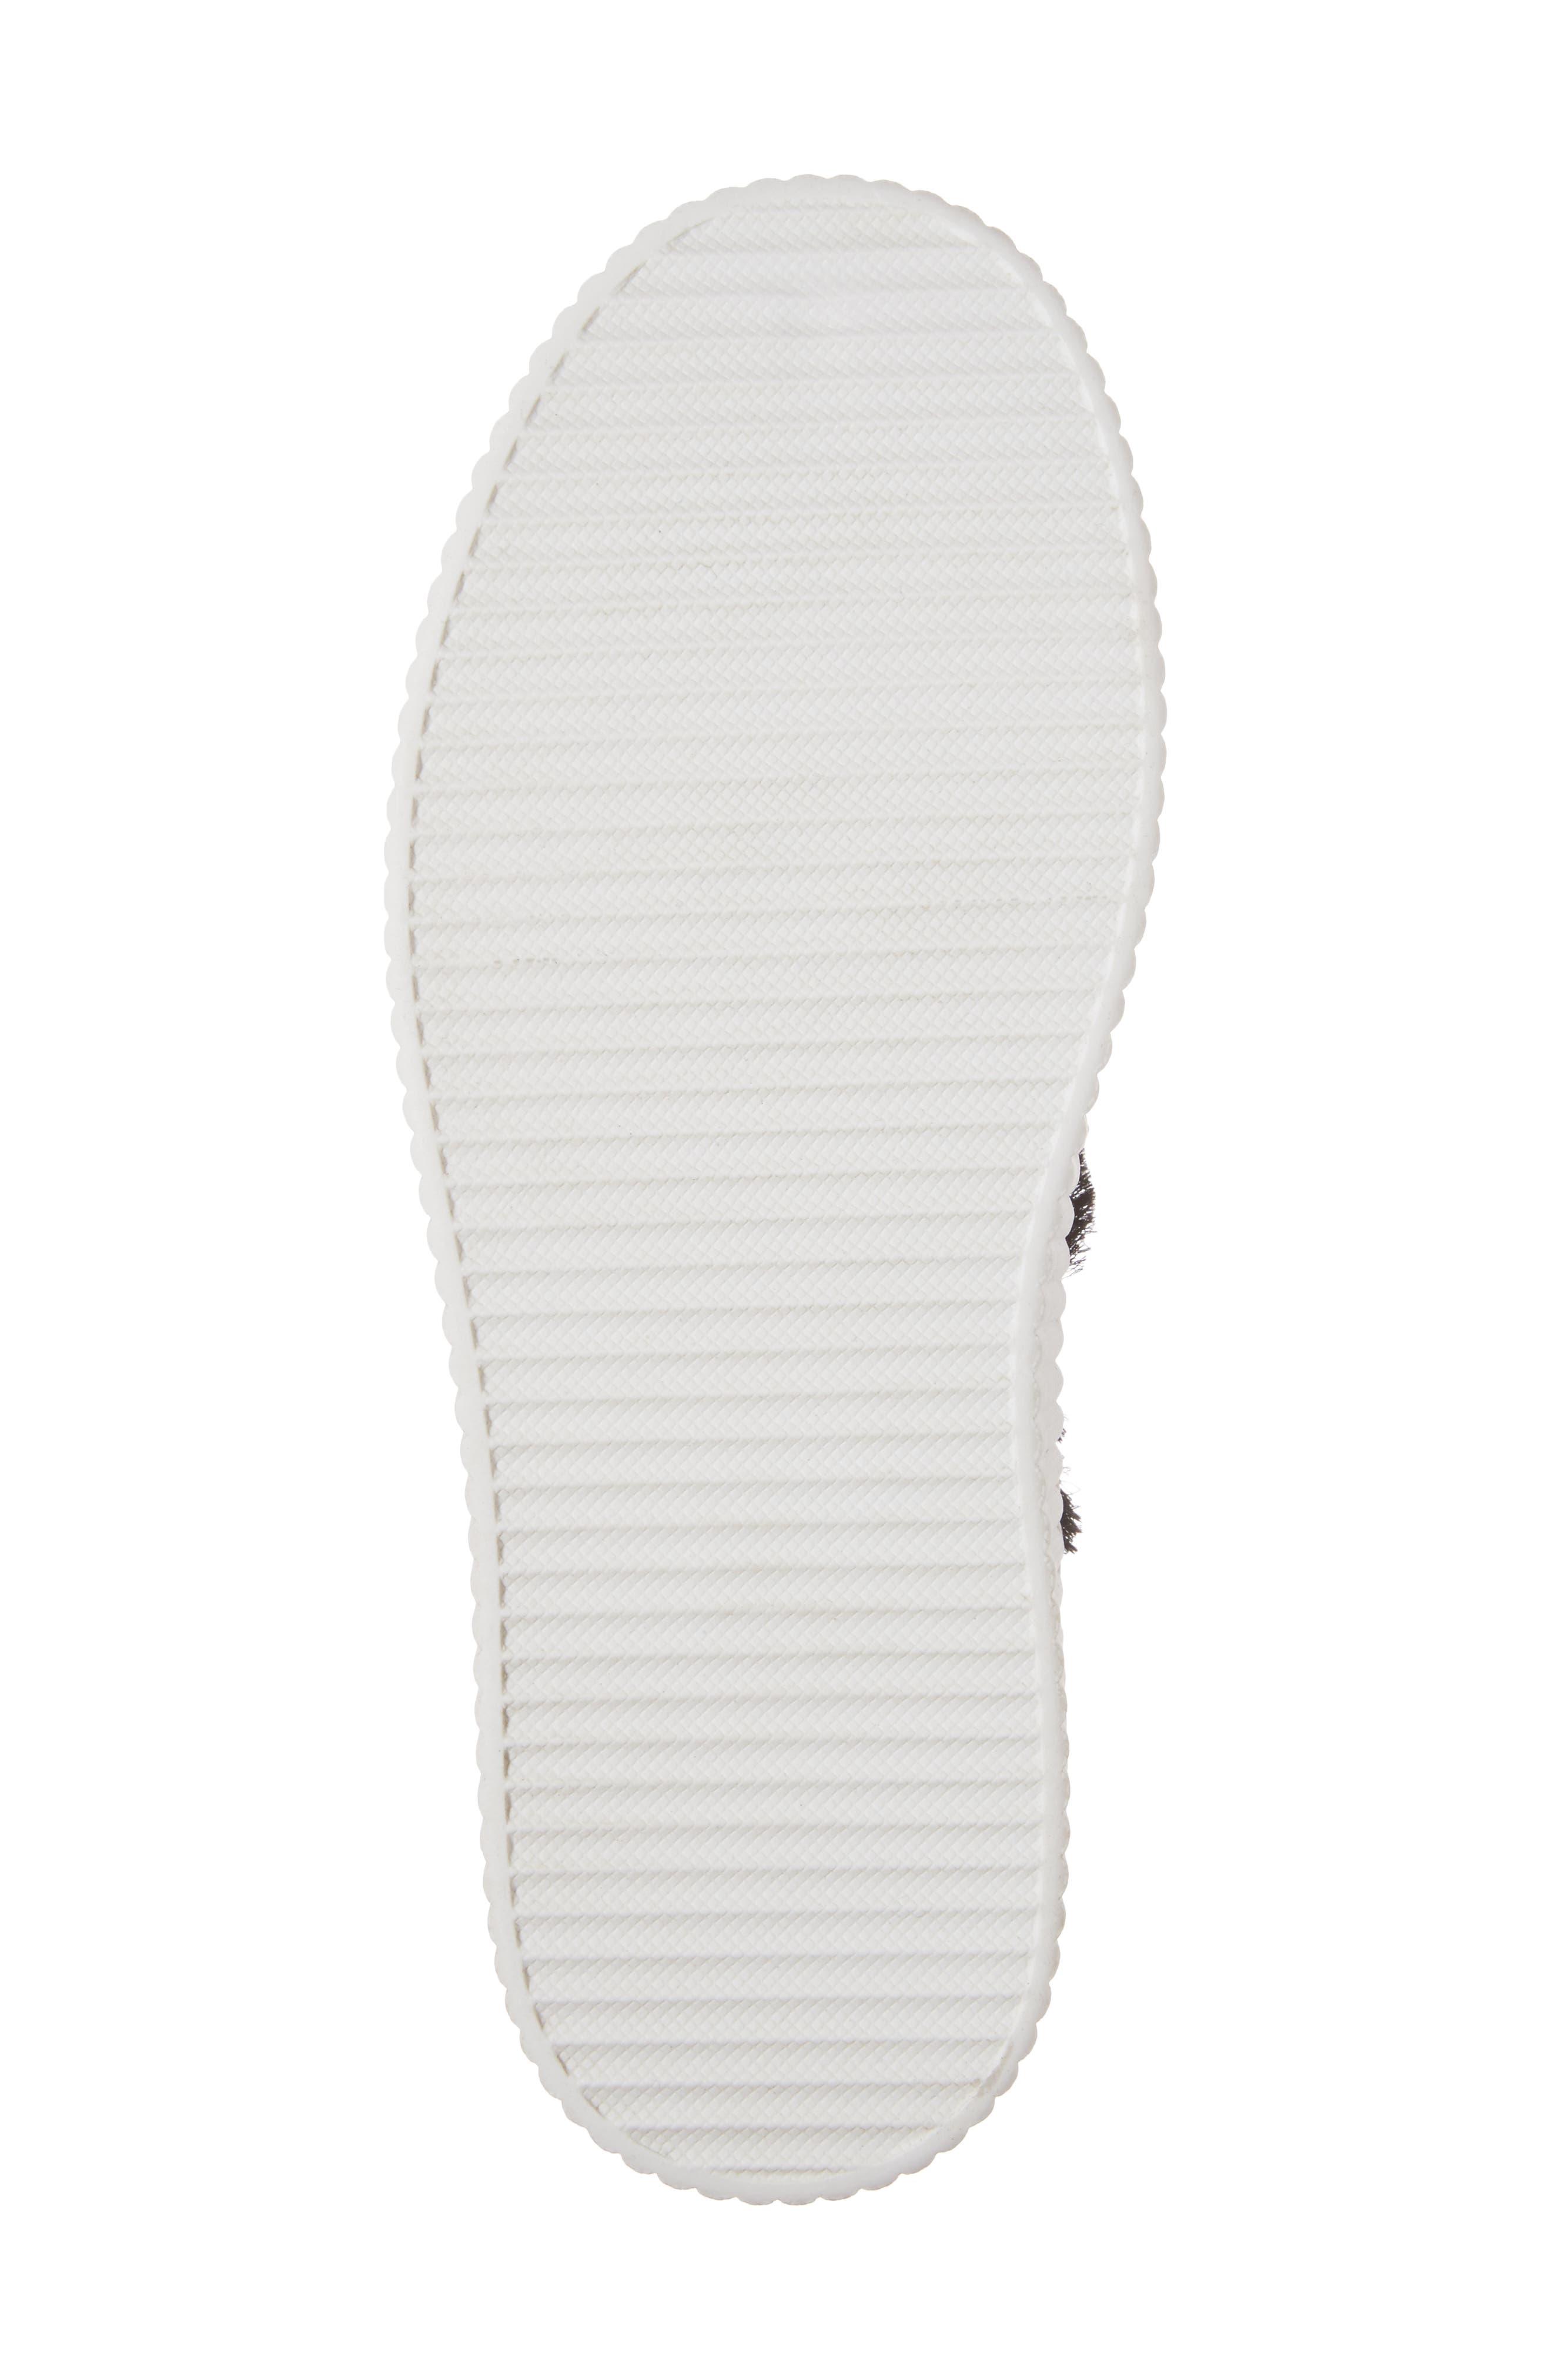 Elder Fringed Platform Sneaker,                             Alternate thumbnail 6, color,                             Black